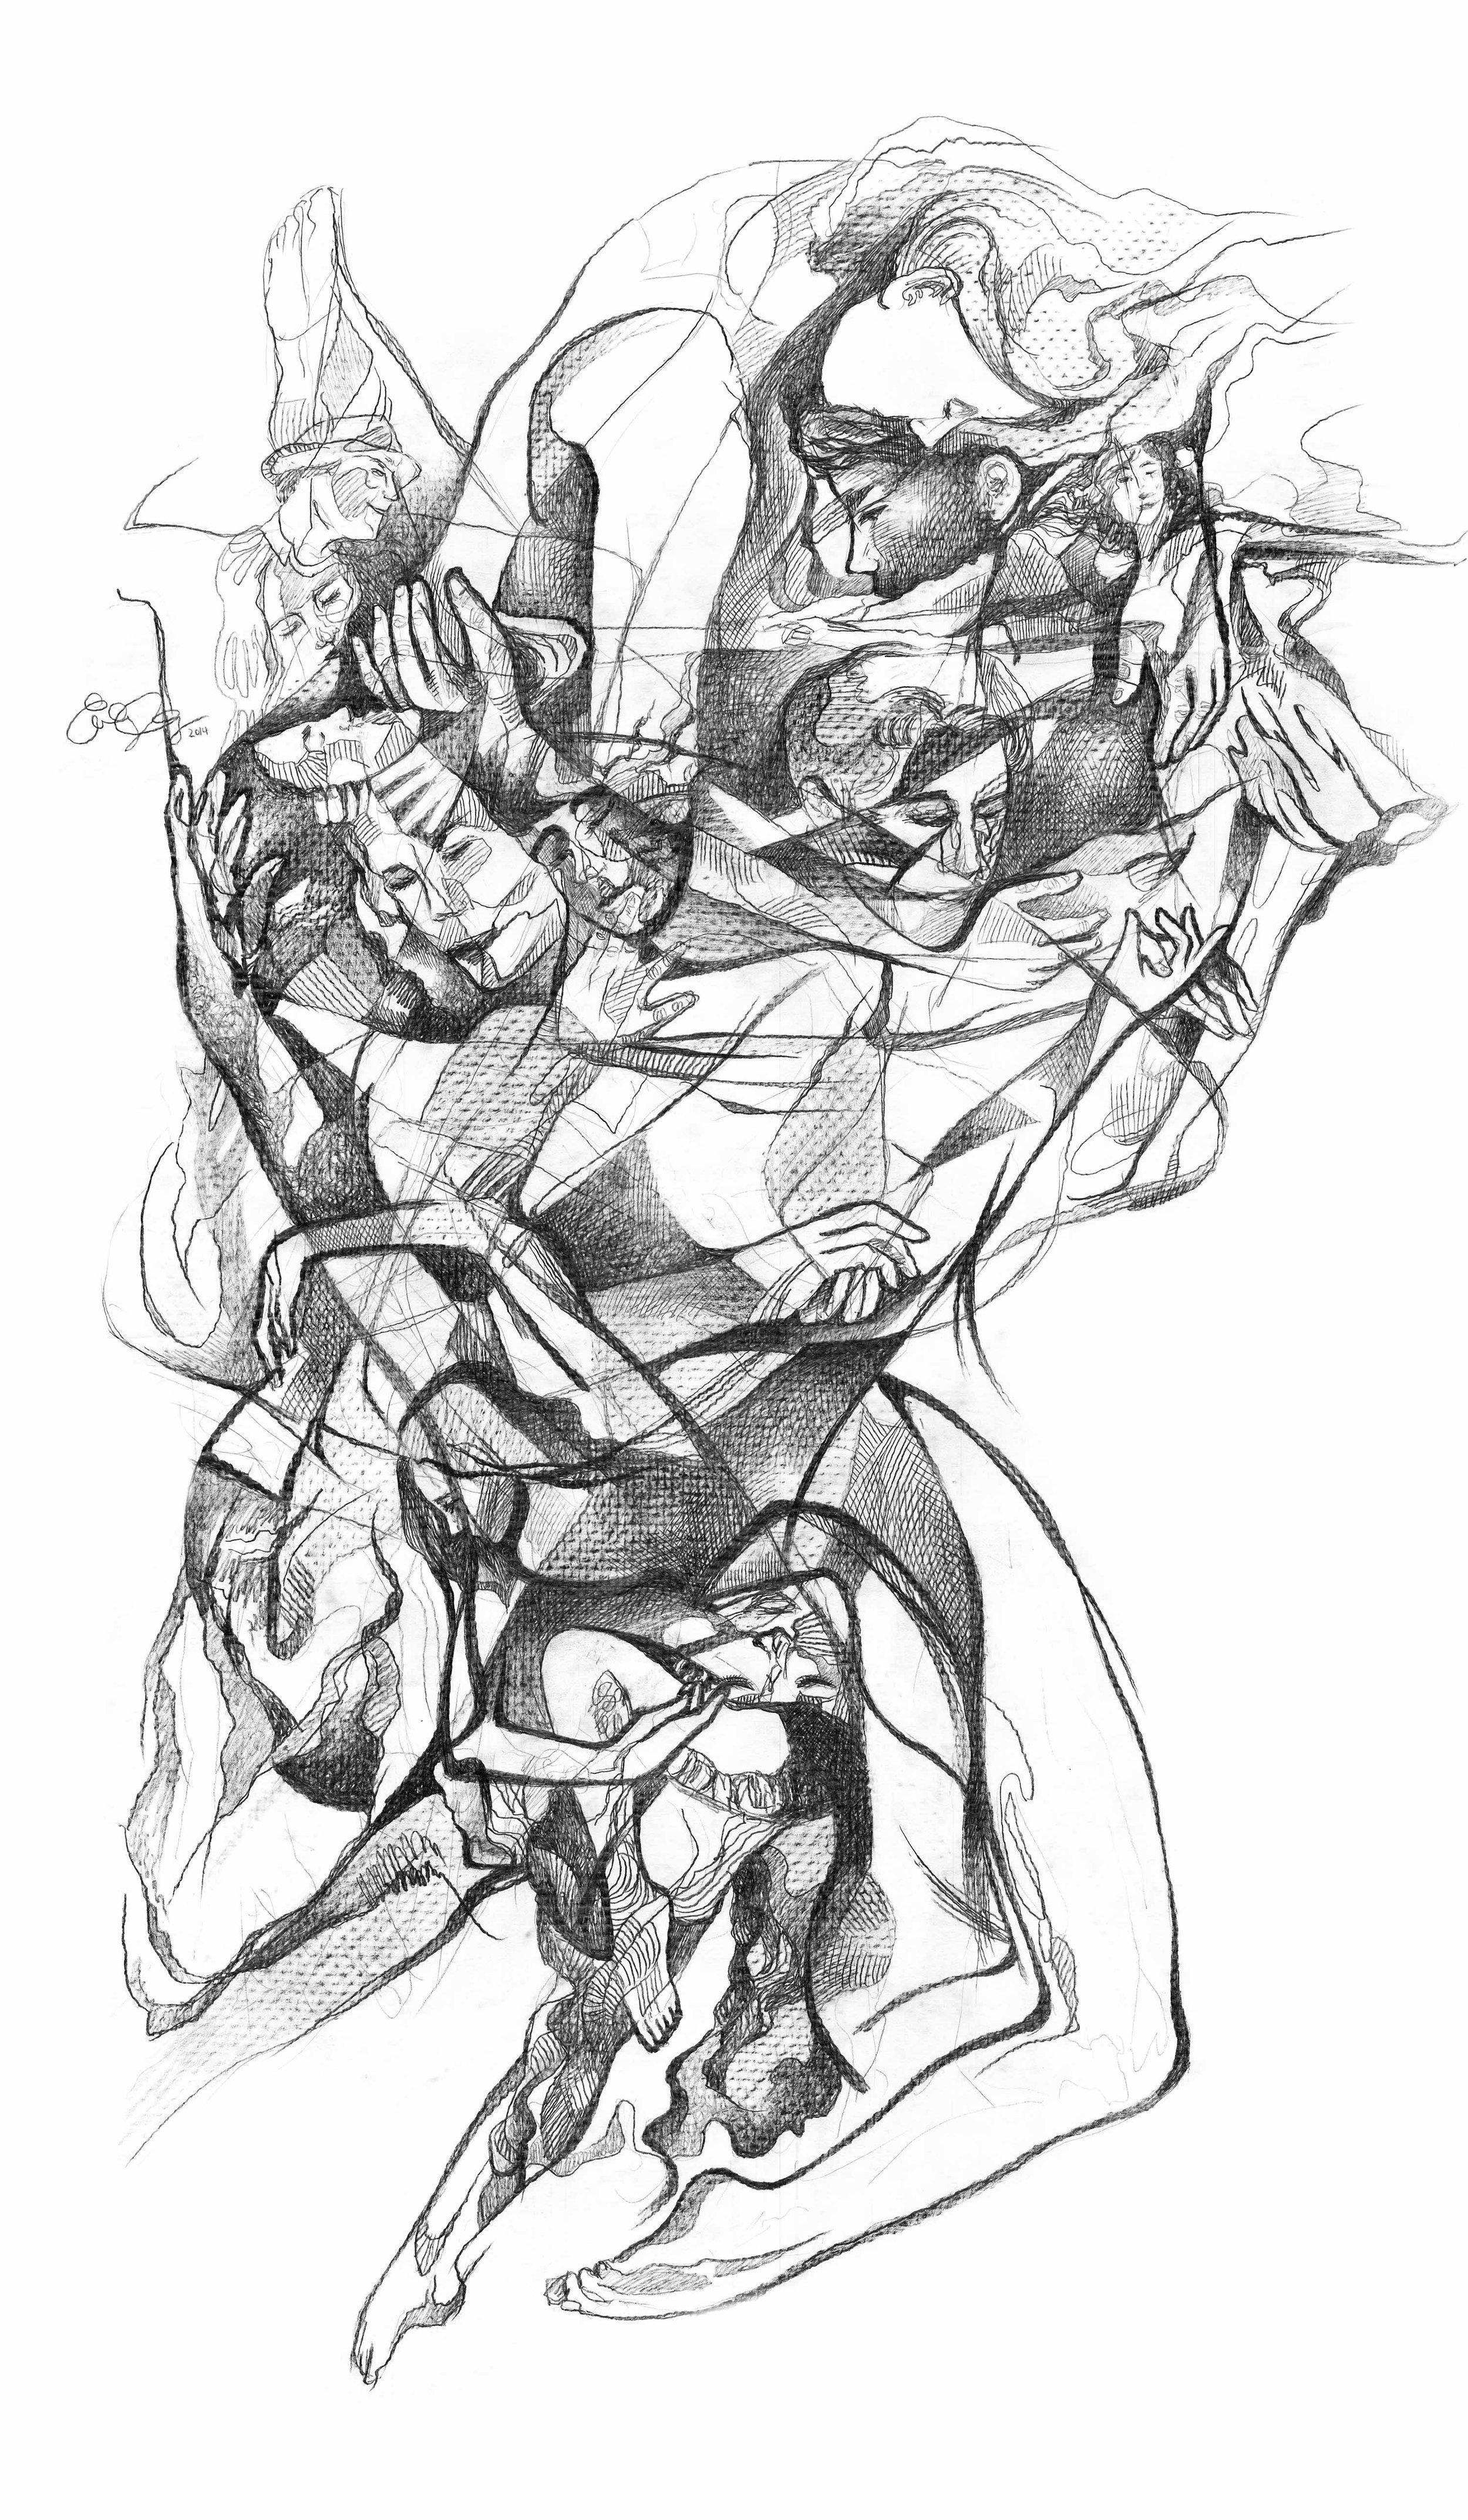 graphite-scanned-art-03-web-imageoptim.jpg